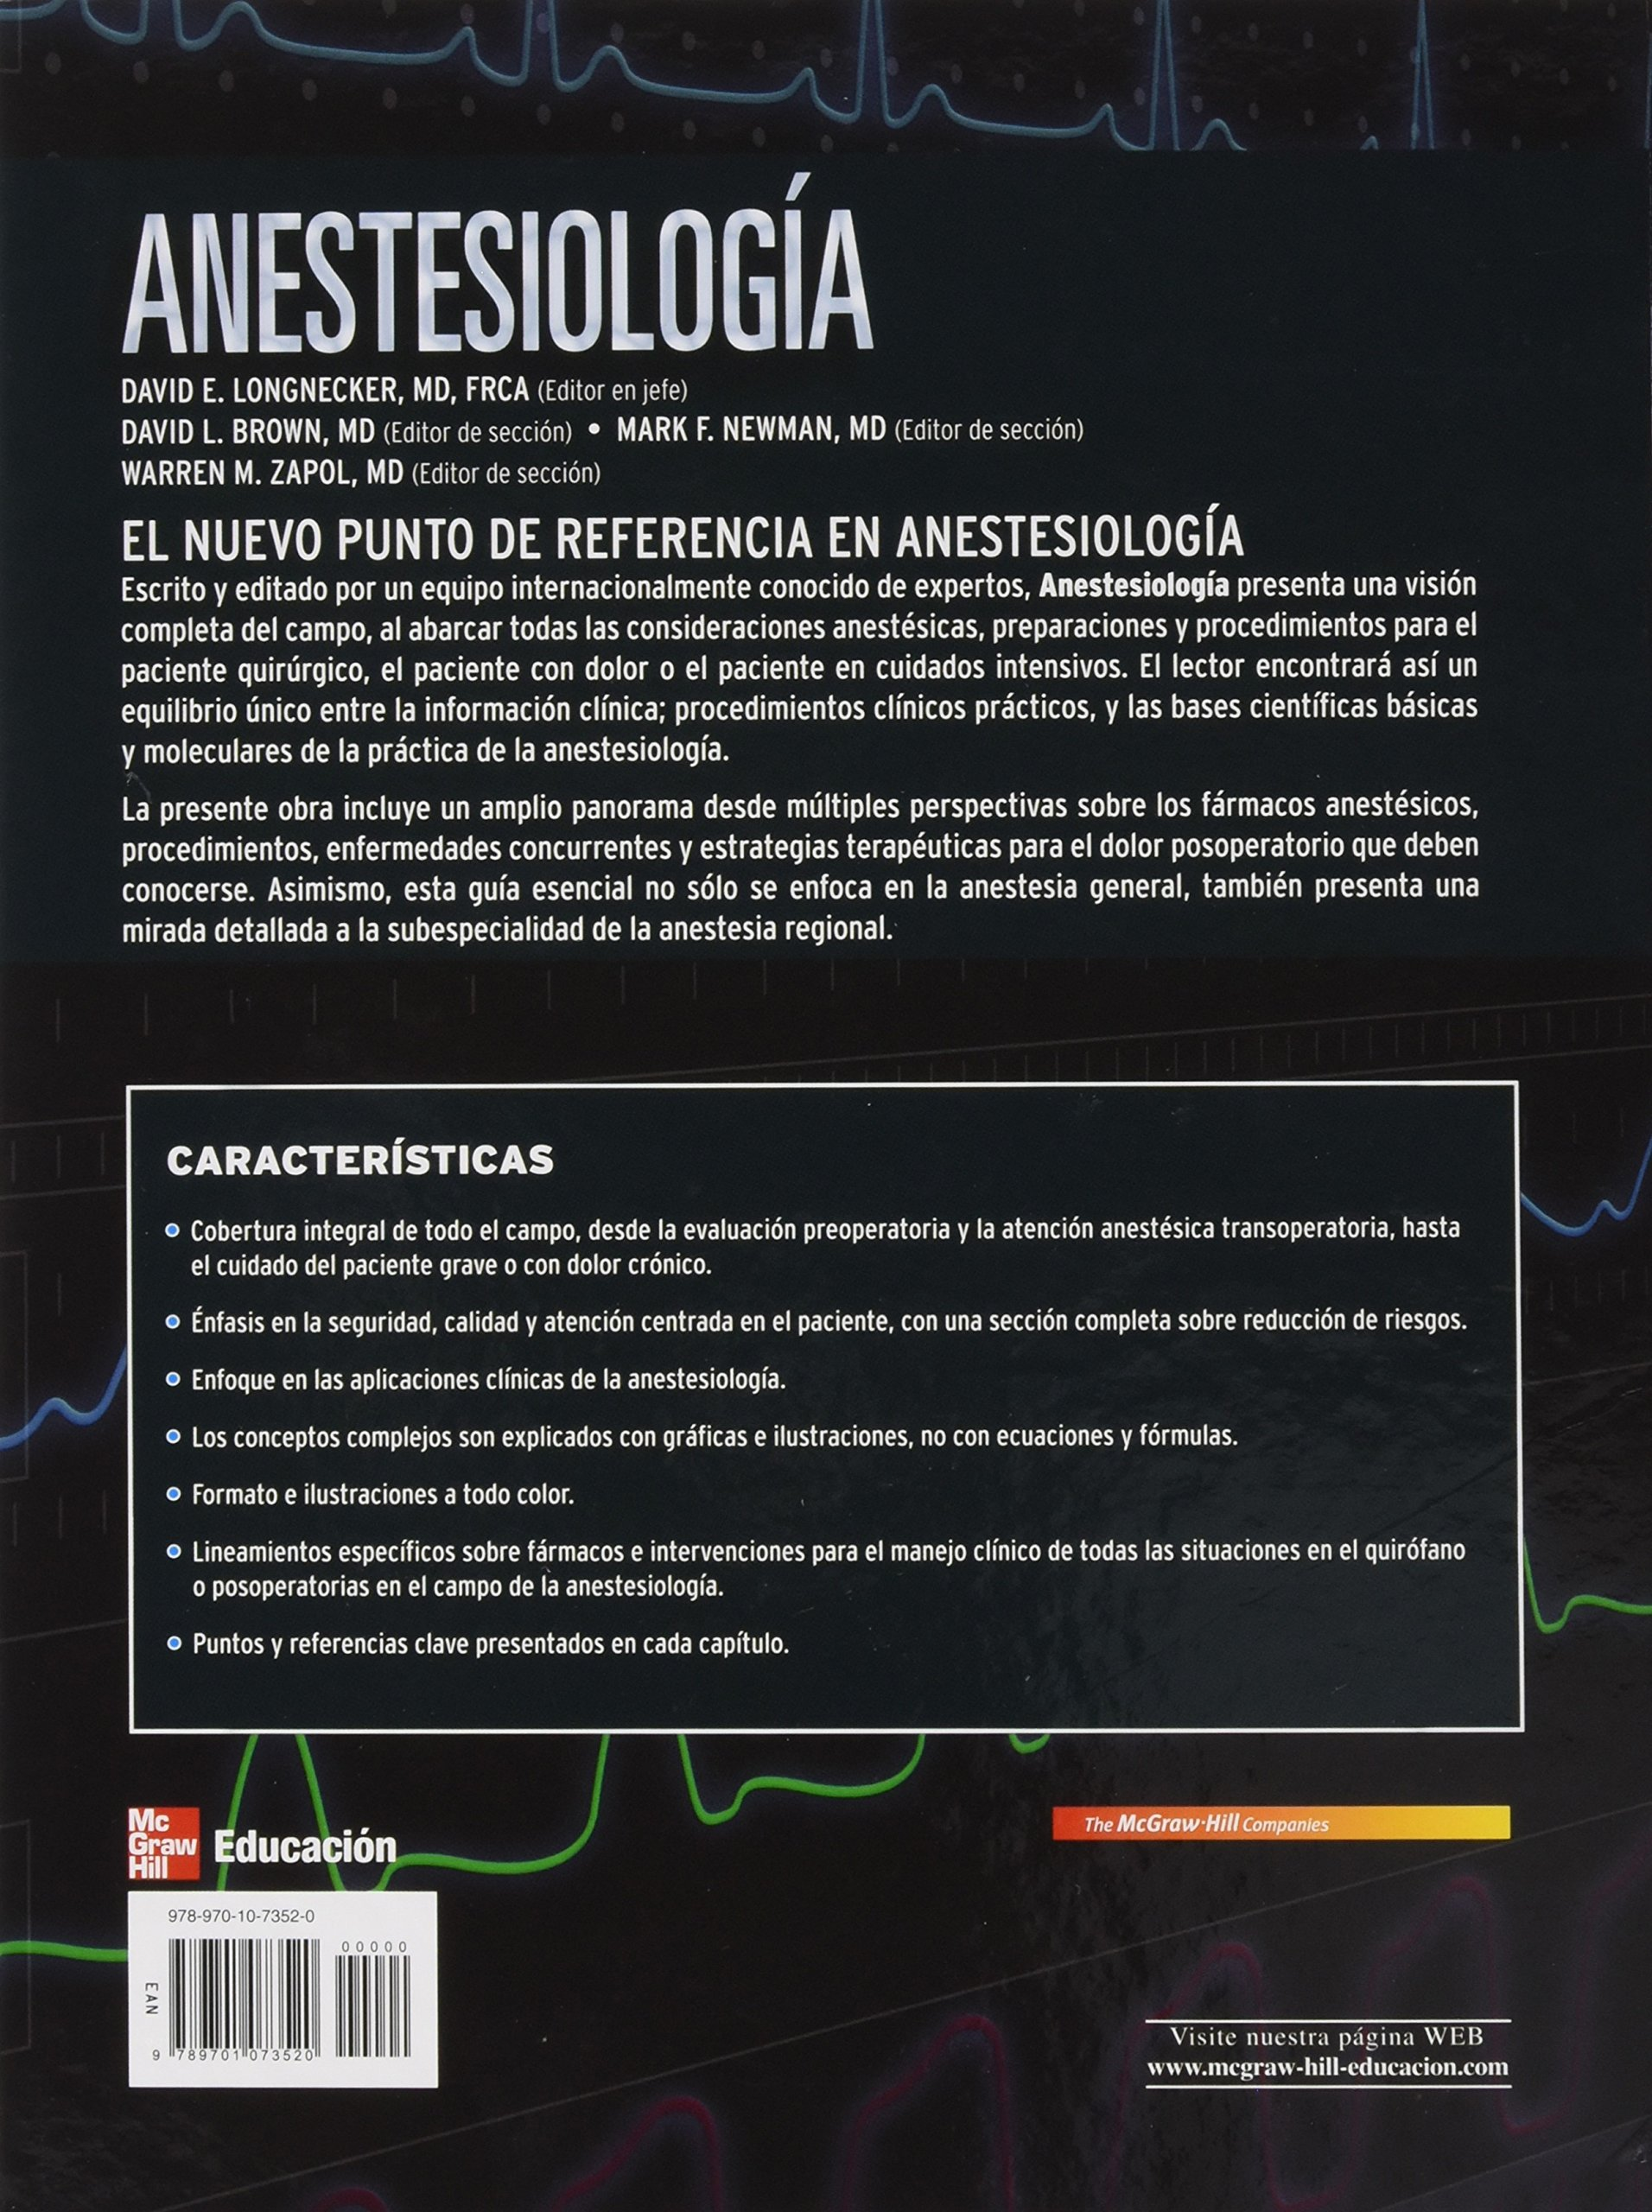 anestesiologia longnecker